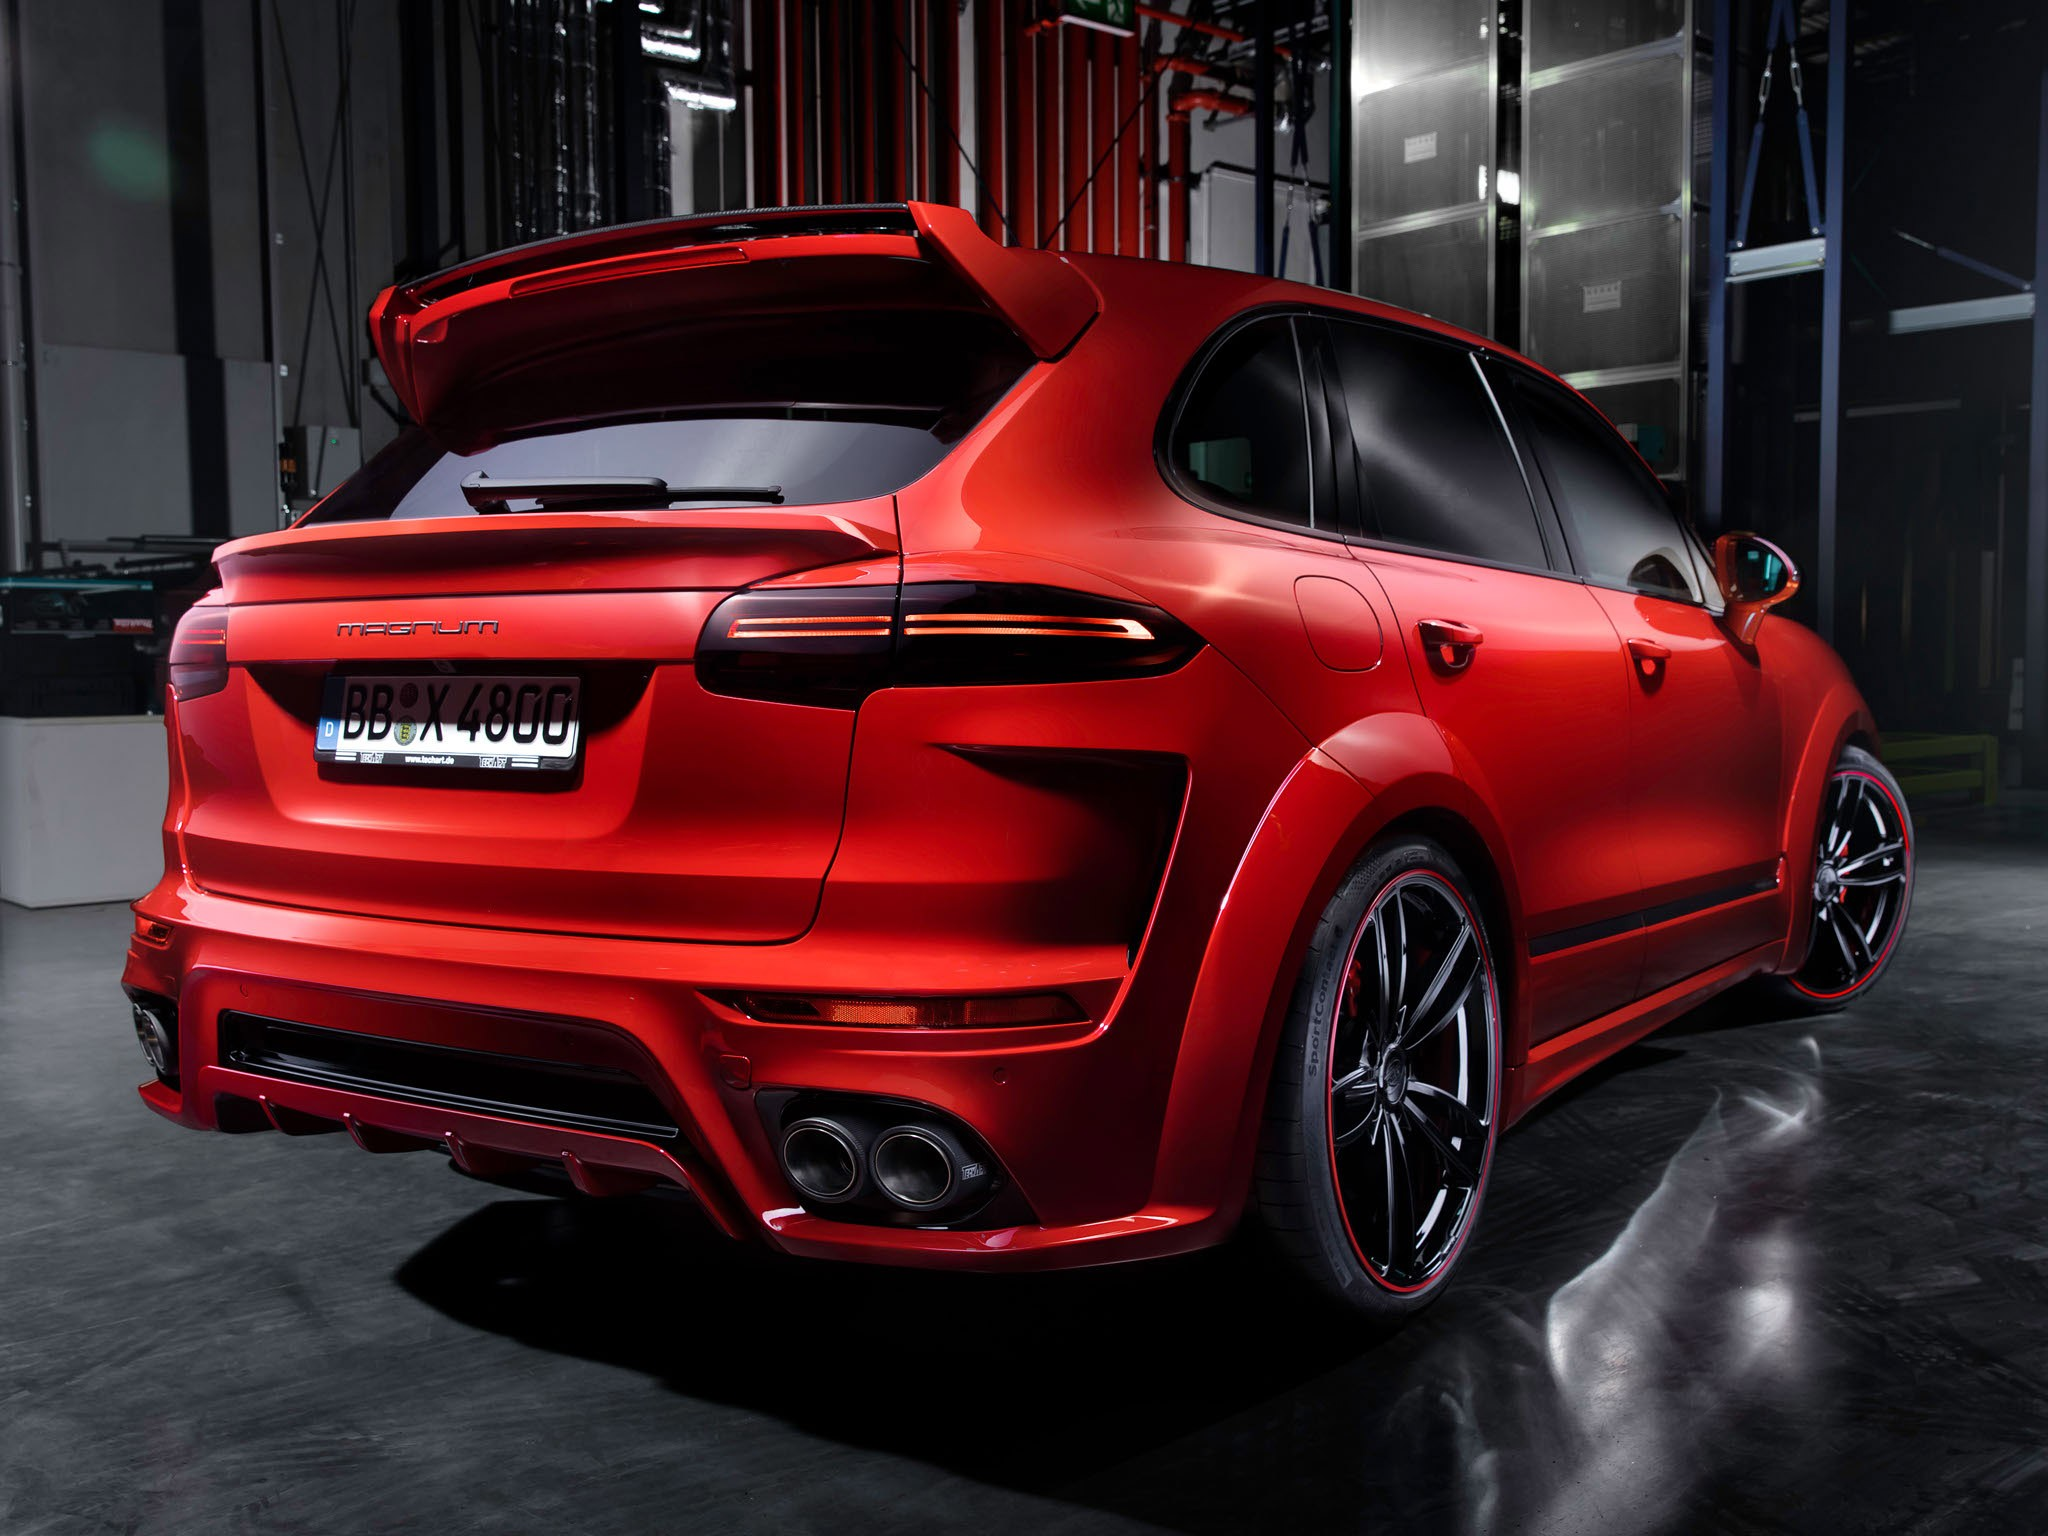 2015 Techart Porsche Cayenne Magnum 958